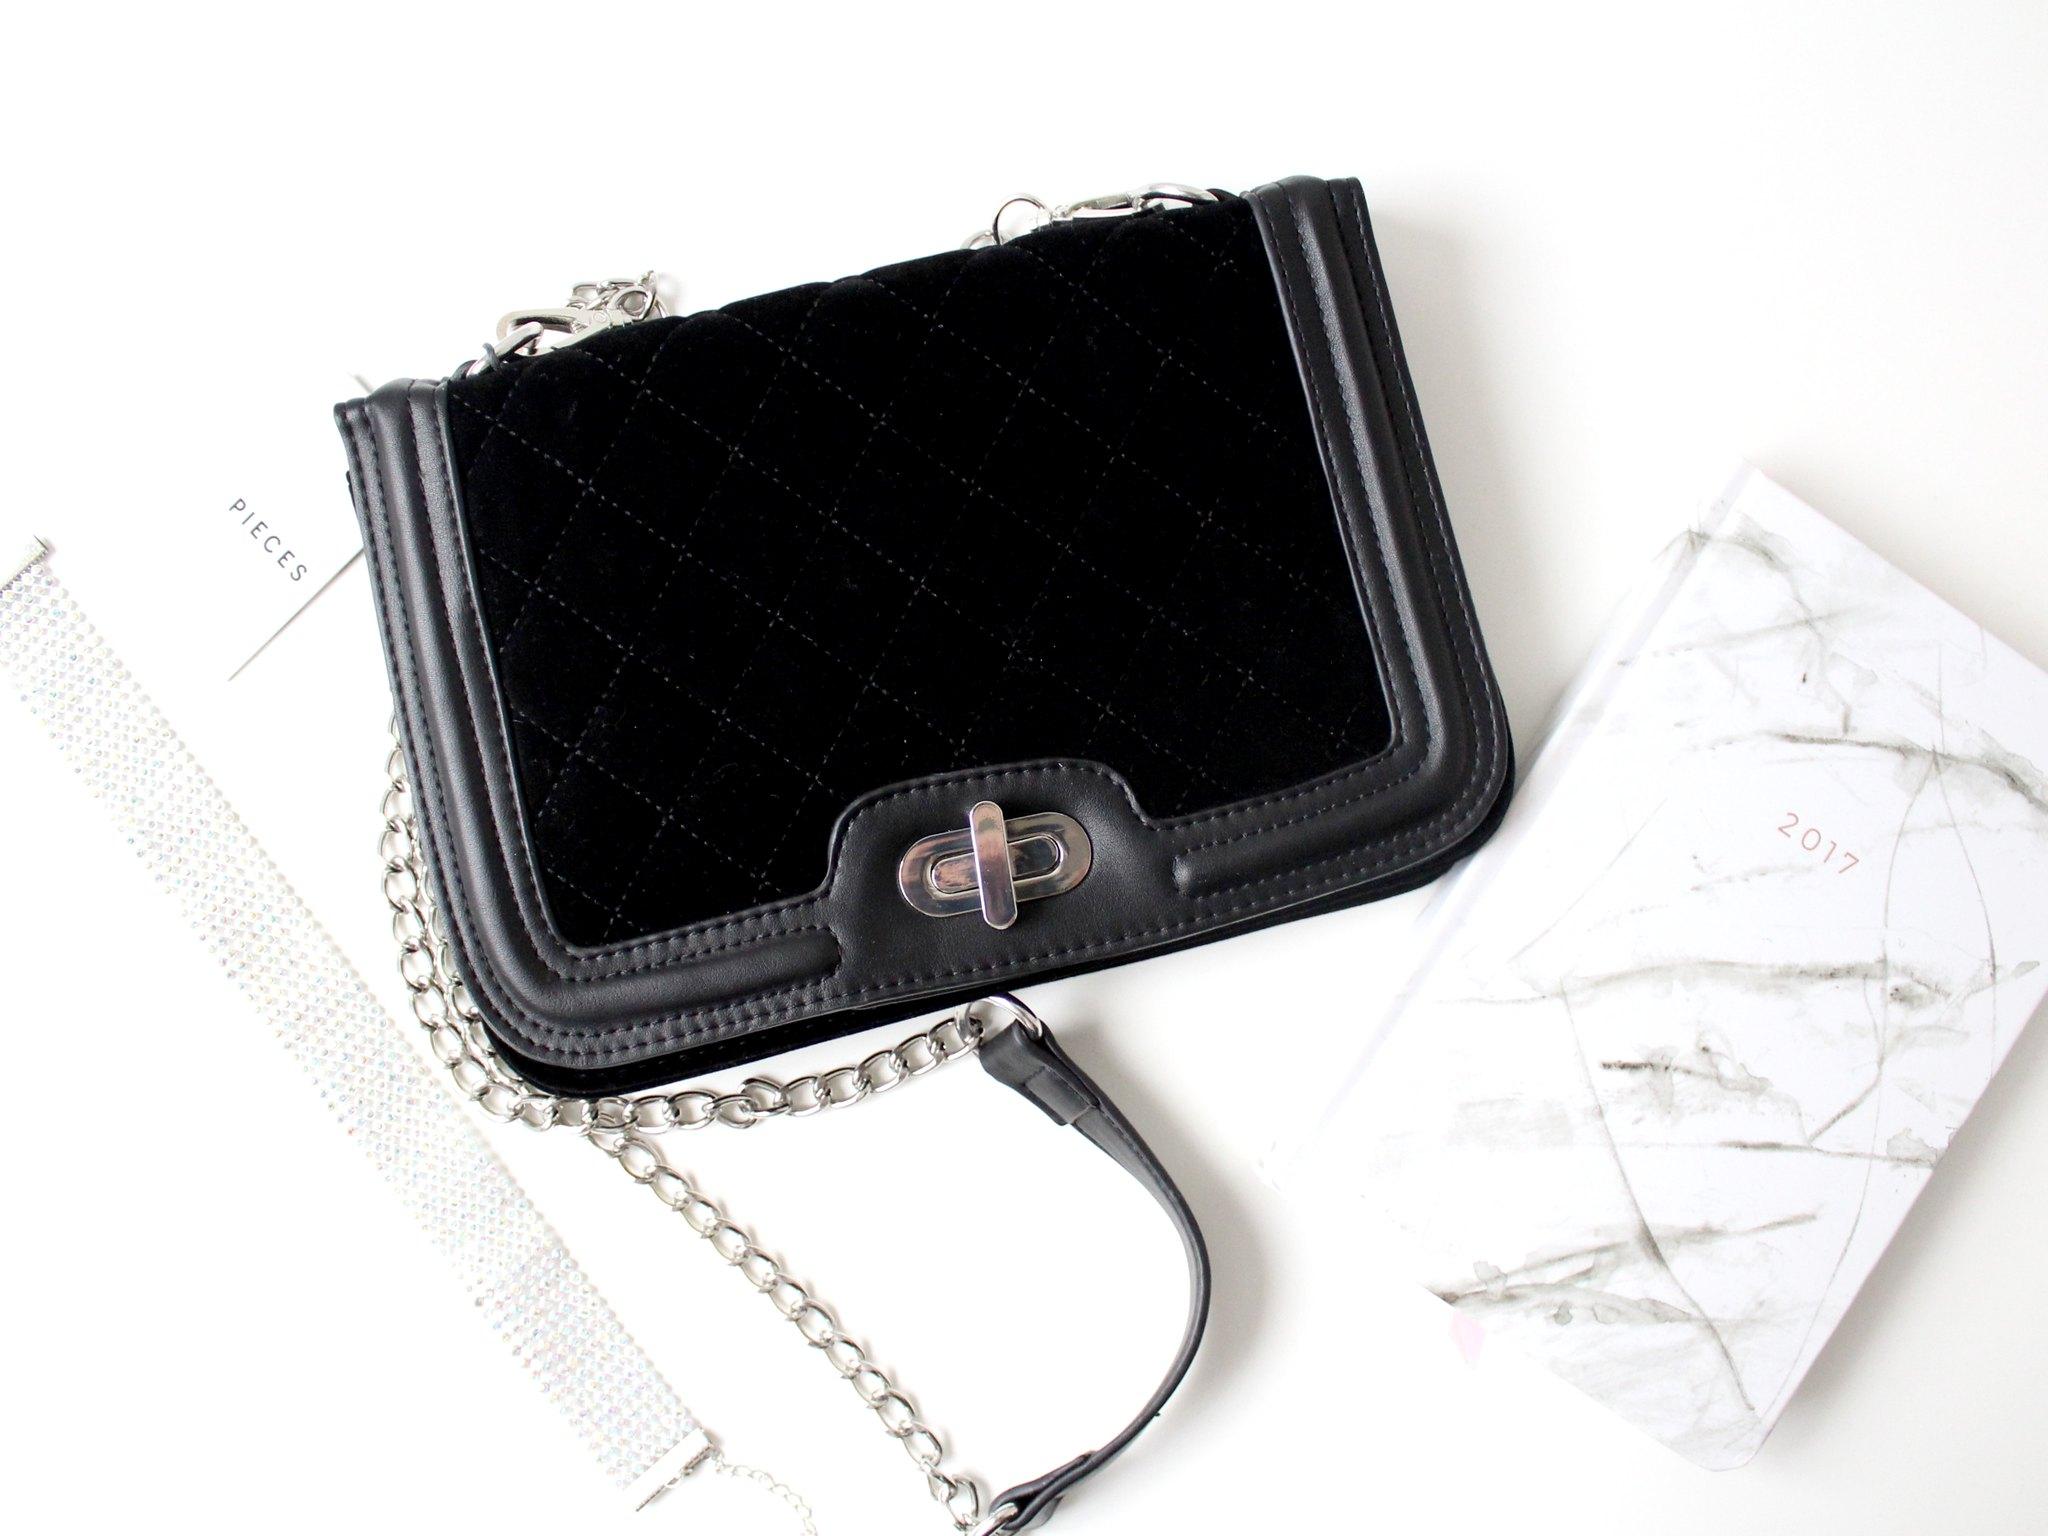 Musta pikkulaukku